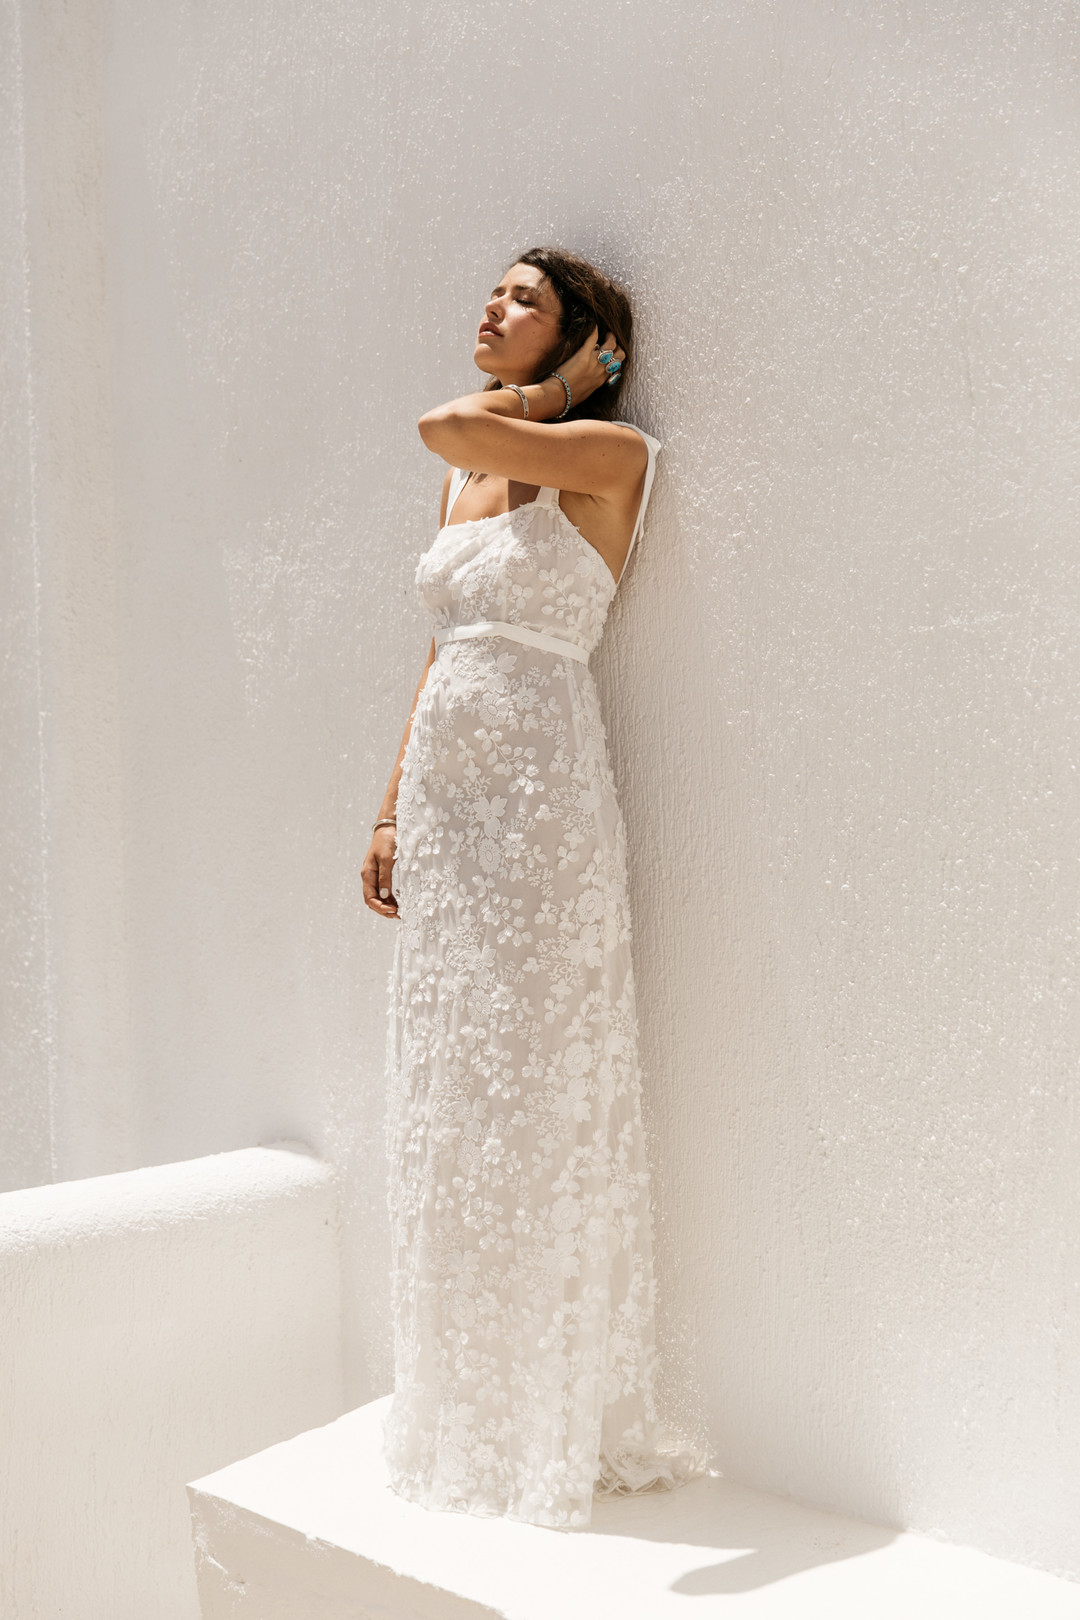 Dress main 2x 1543778414